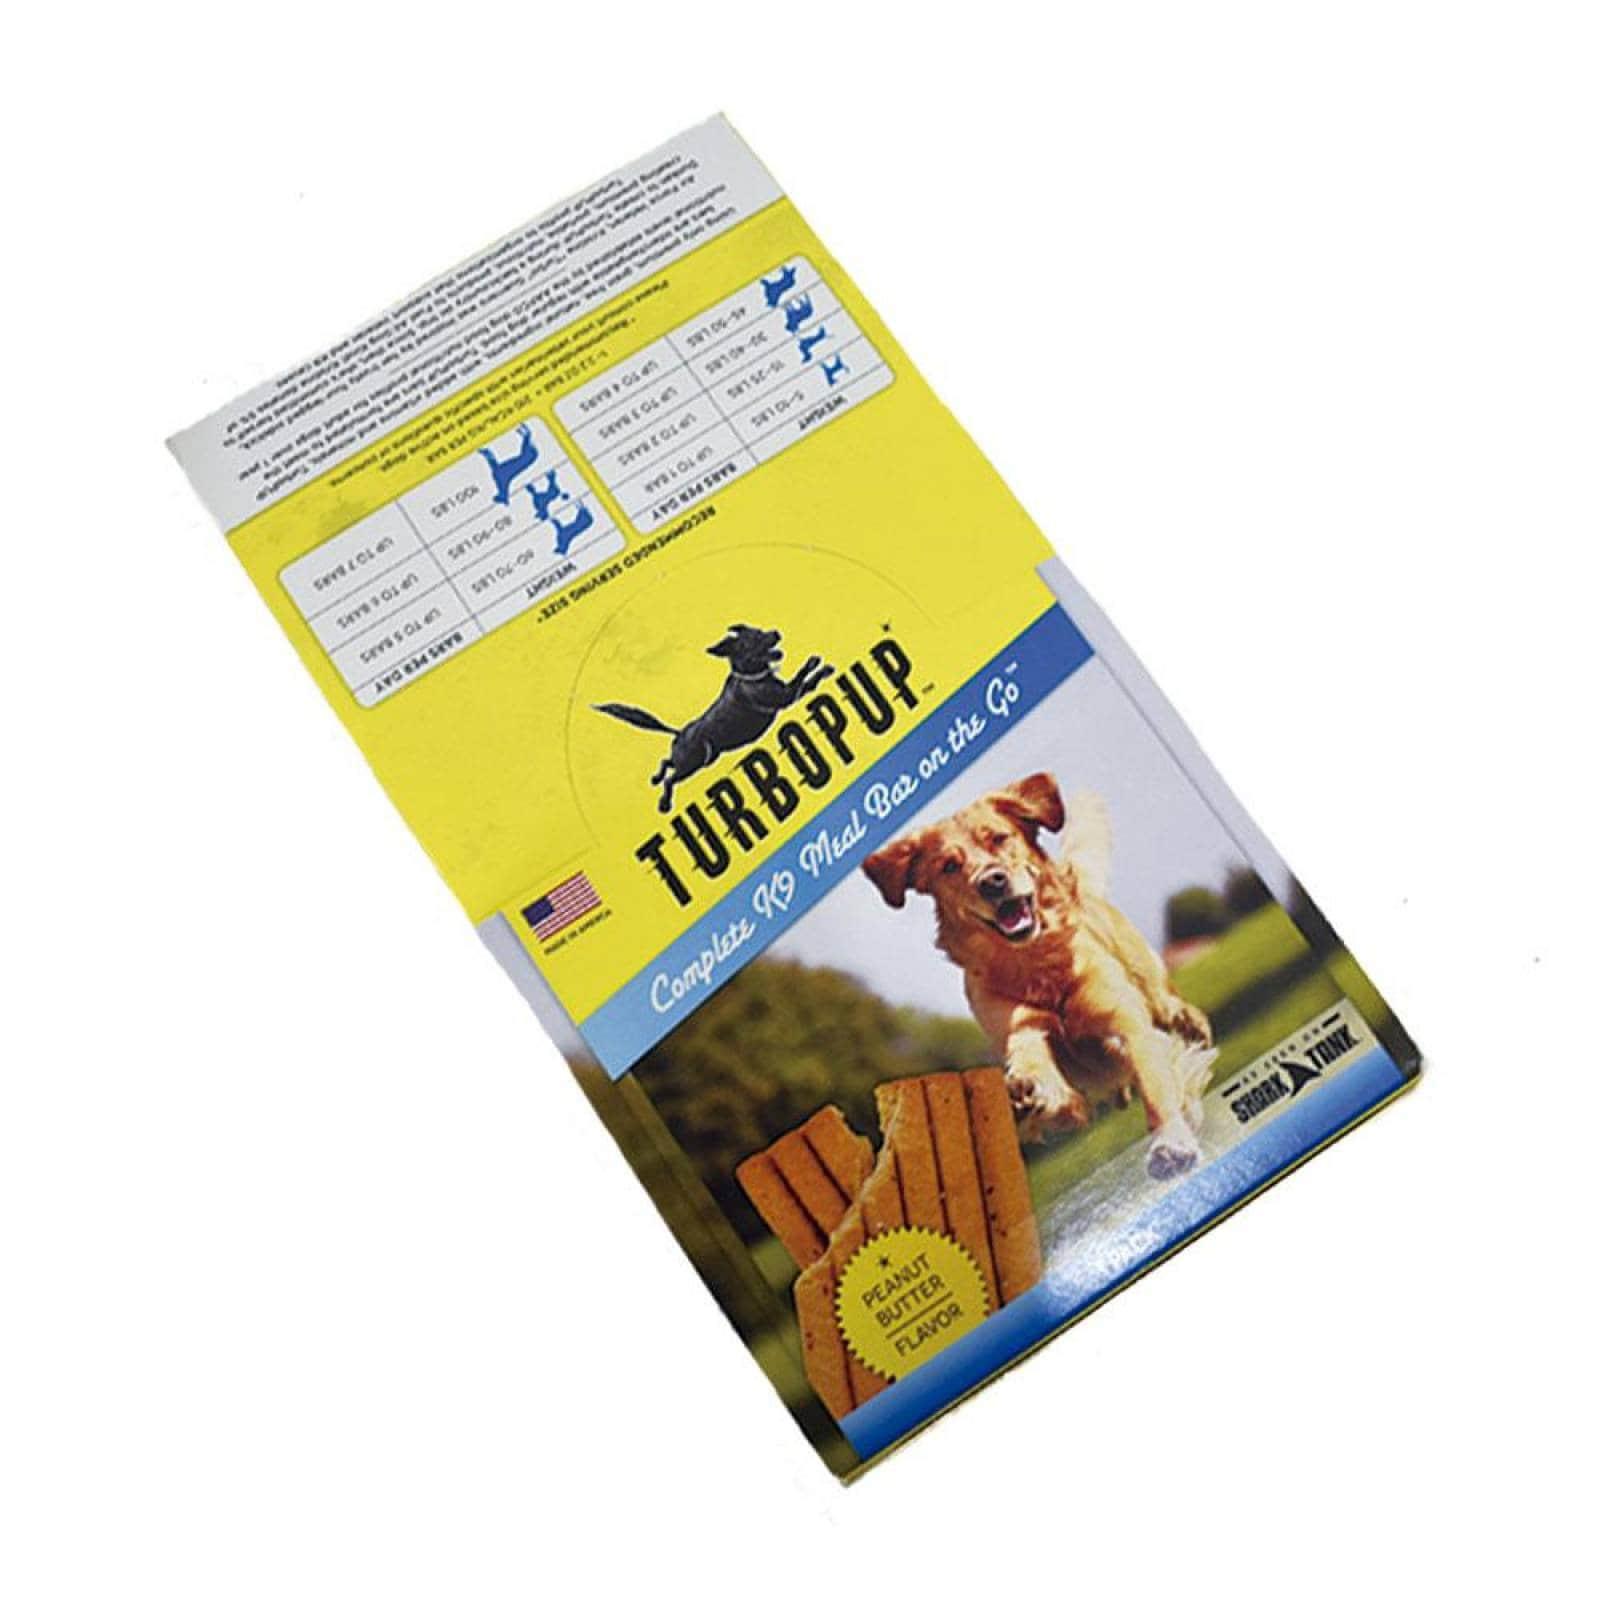 Alimento K9 en Barras Caja de 12 paquetes de 1 barra Crema de Cacahuate